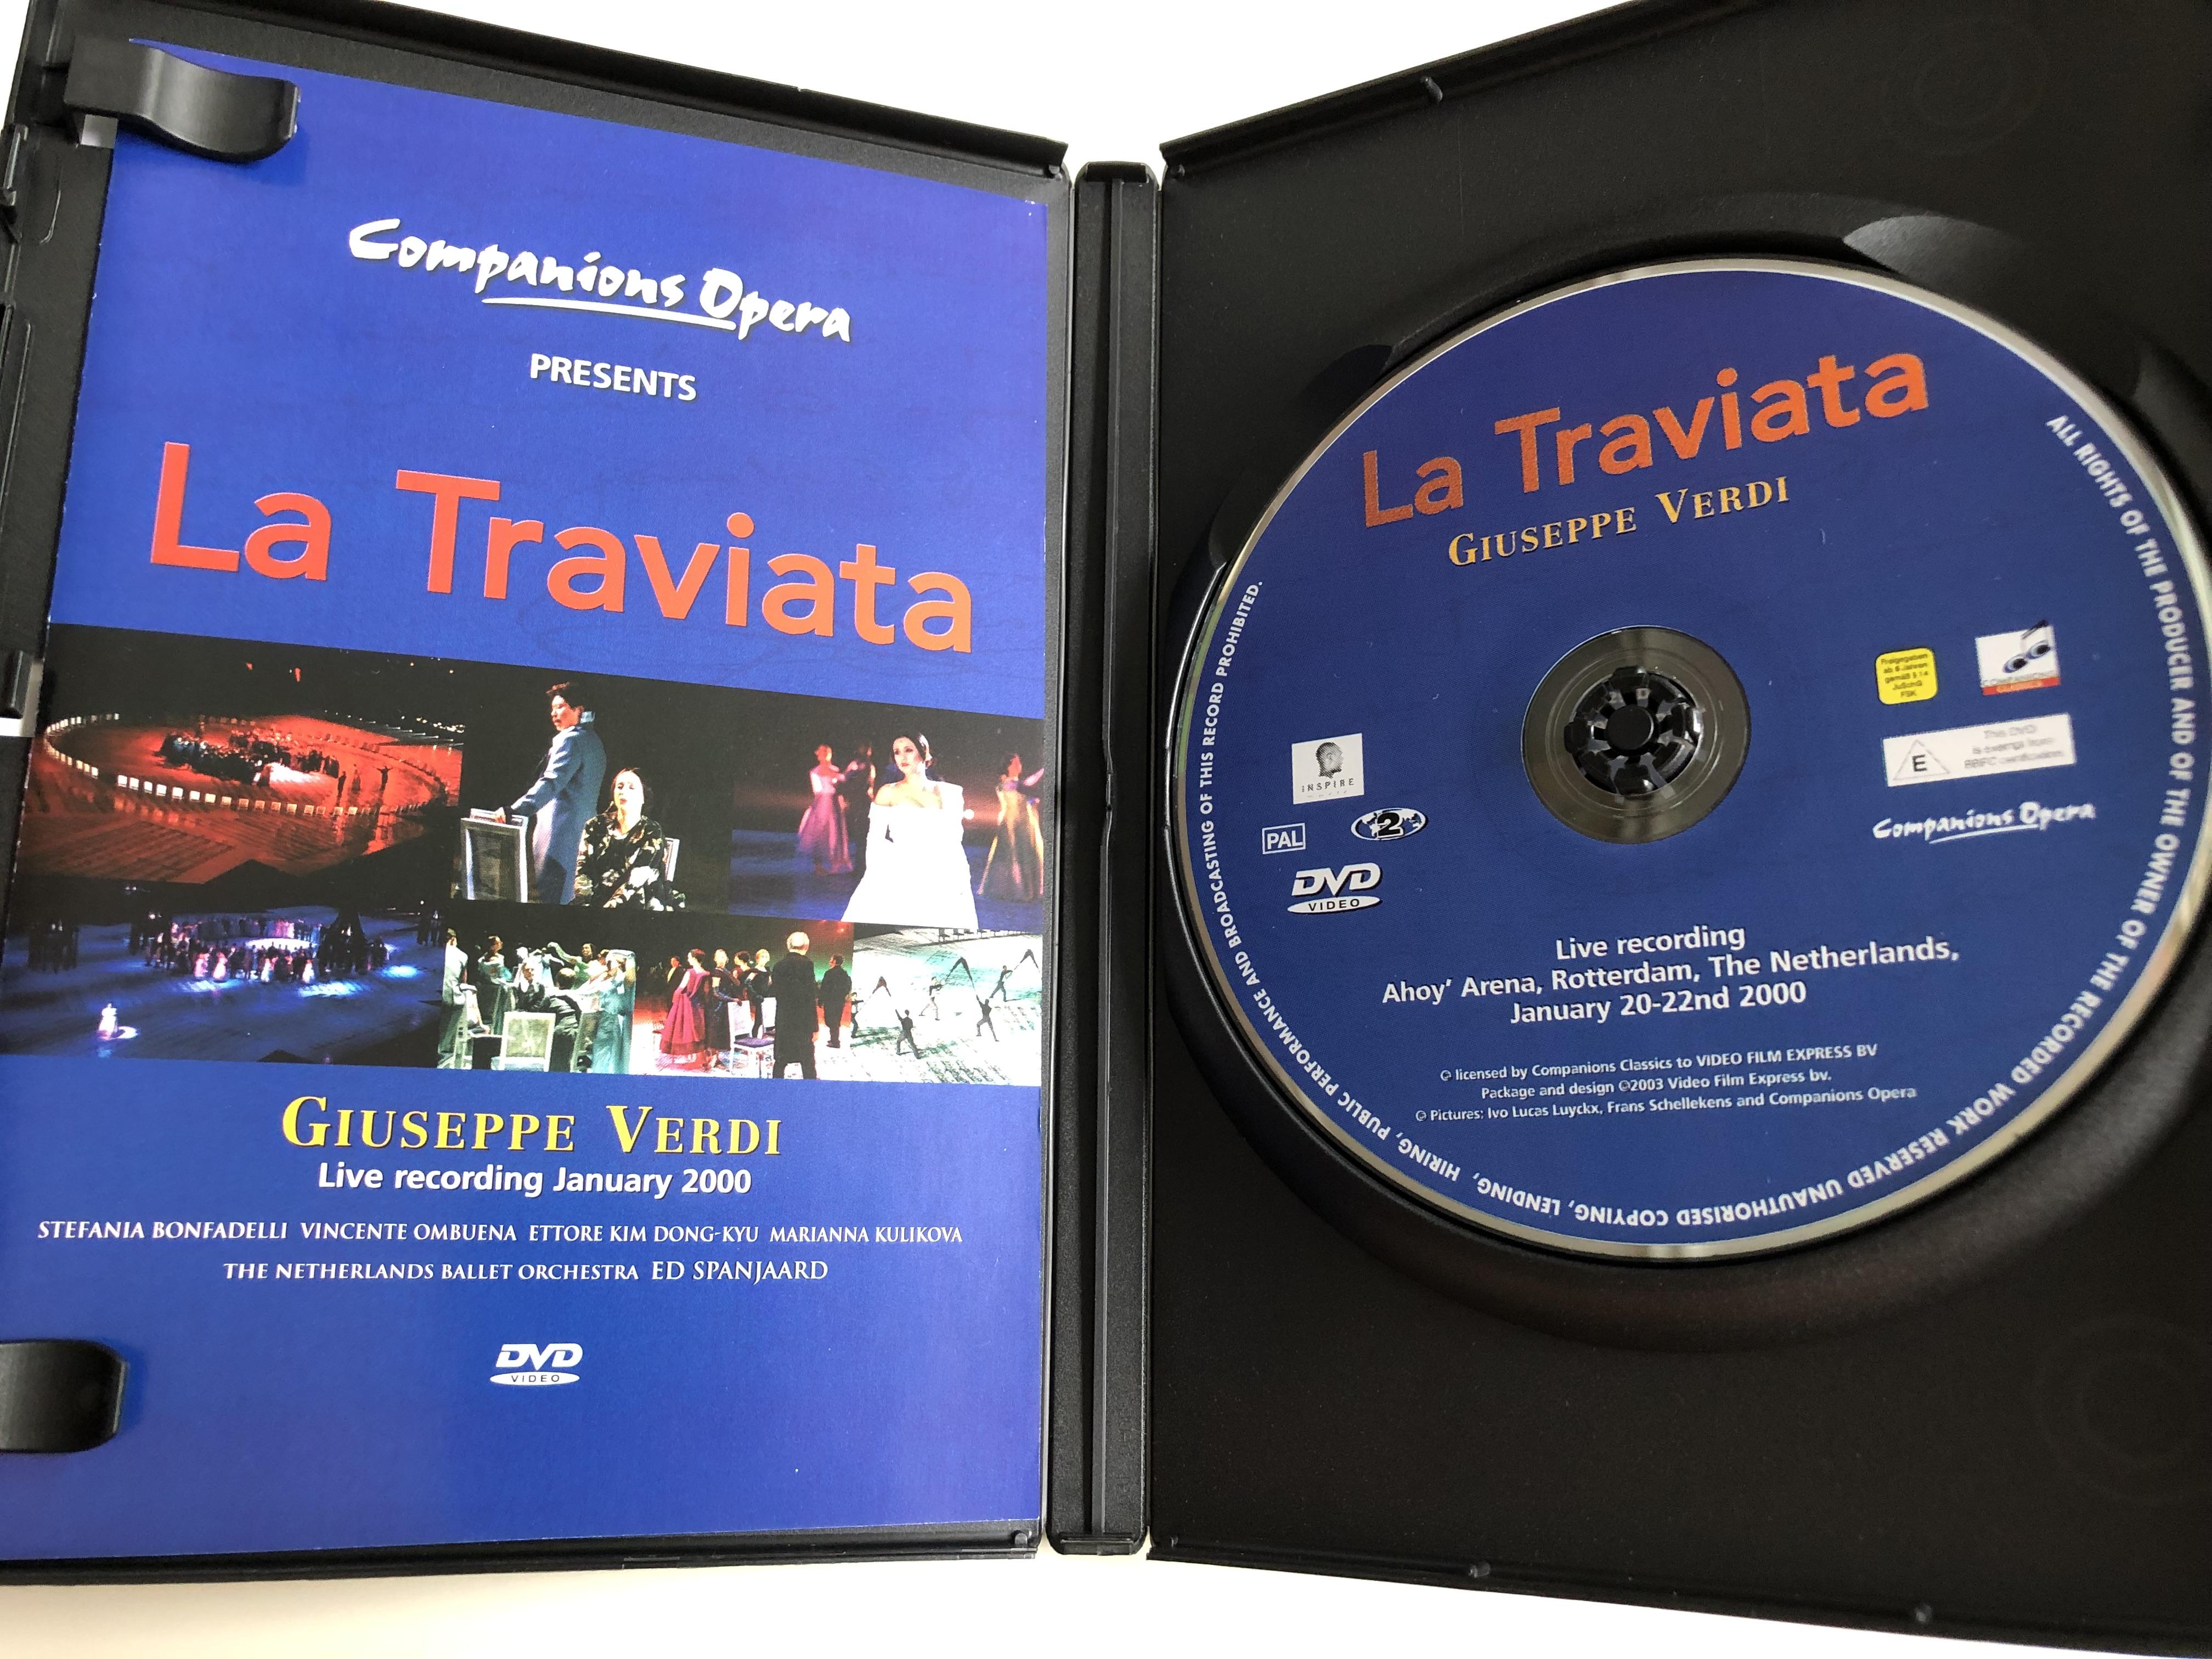 companions-opera-pr-sentiert-la-traviata-giuseppe-verdi-live-aufgezeichnet-im-januar-2000-stefania-bonfadelli-vicente-ombuena-ettore-kim-dong-kyu-marianna-kulikova-niederl-ndische-balletorchester-unter-leitung-von-ed.jpg